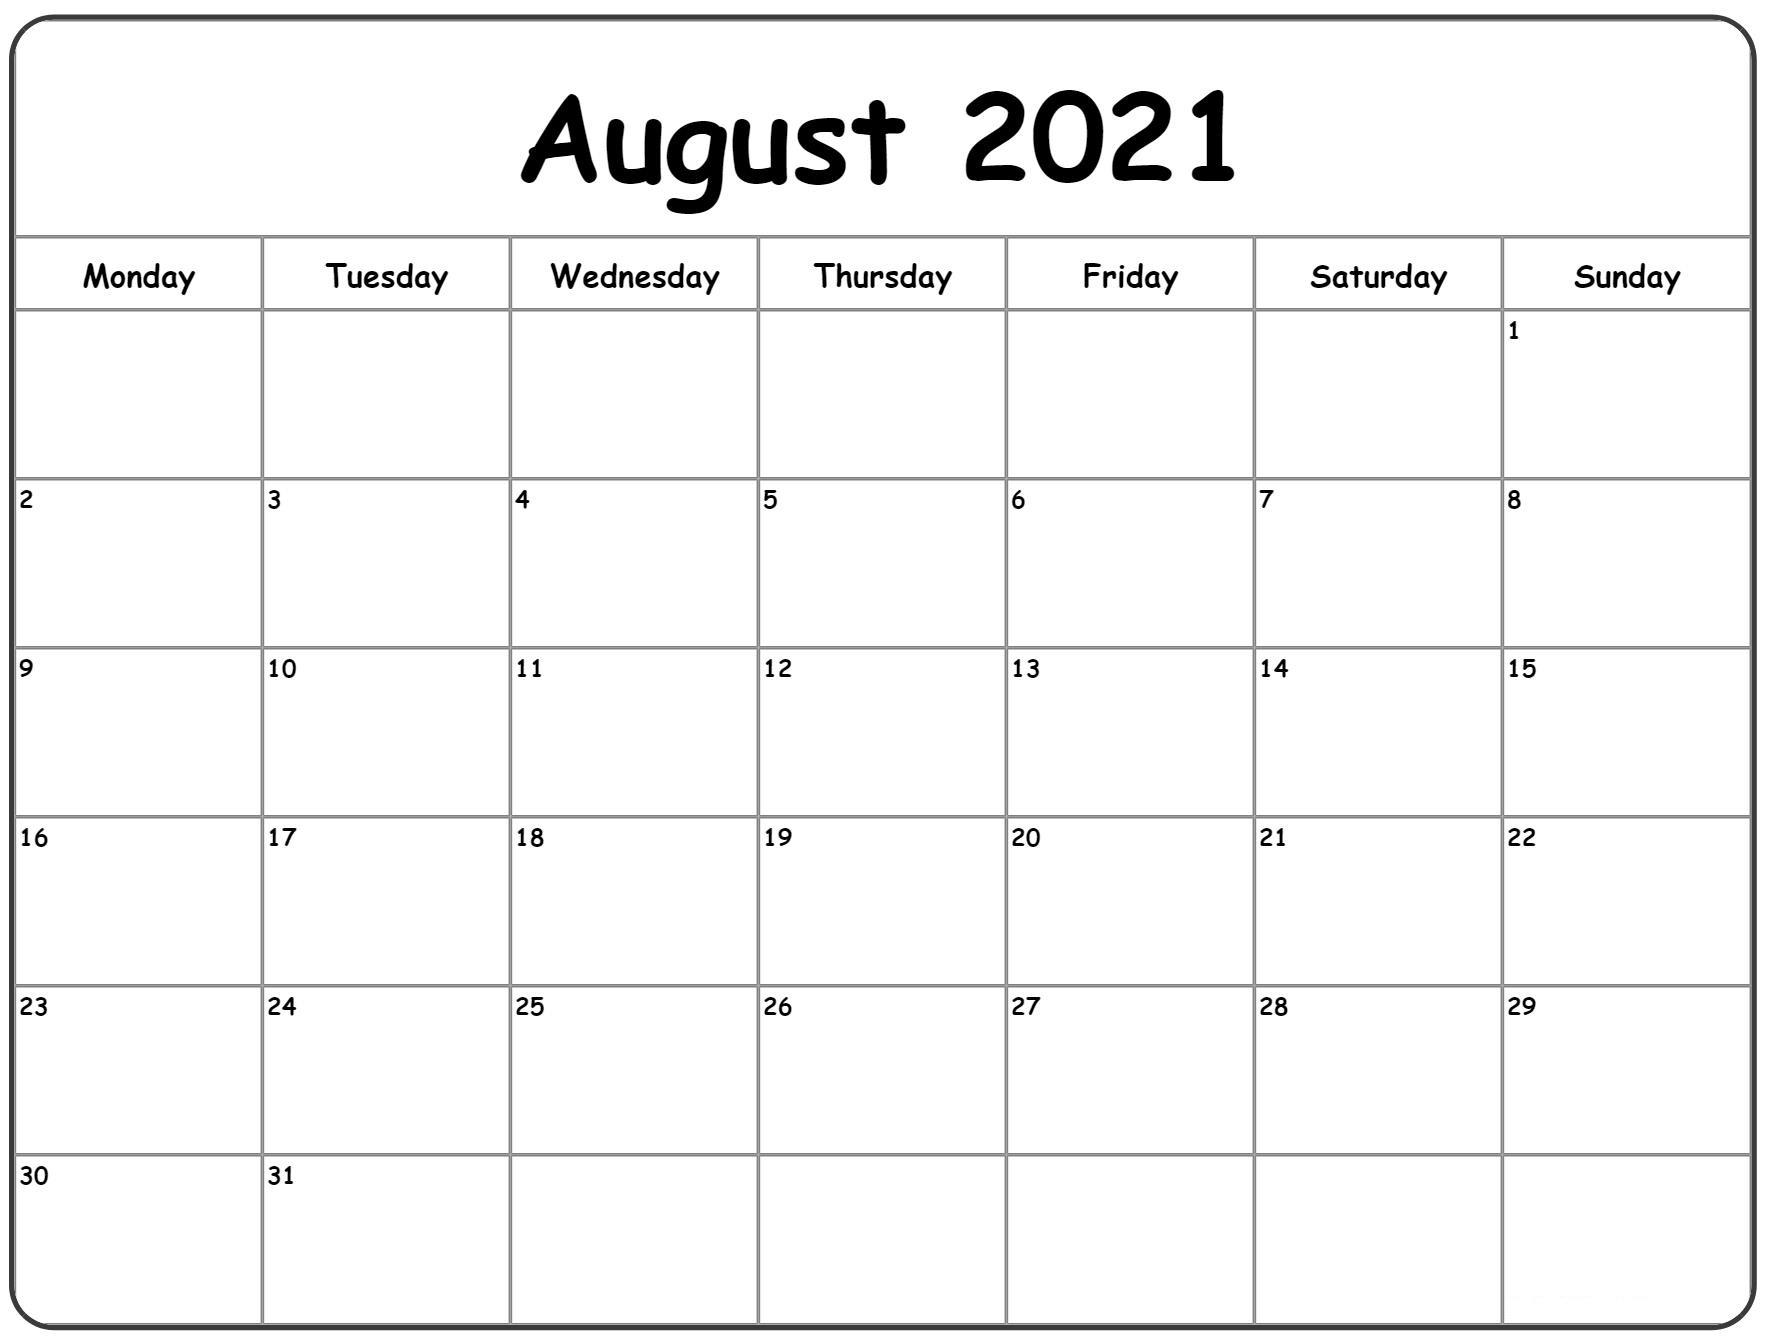 August 2021 Calendar New Excel Word Pdf Template - Printable